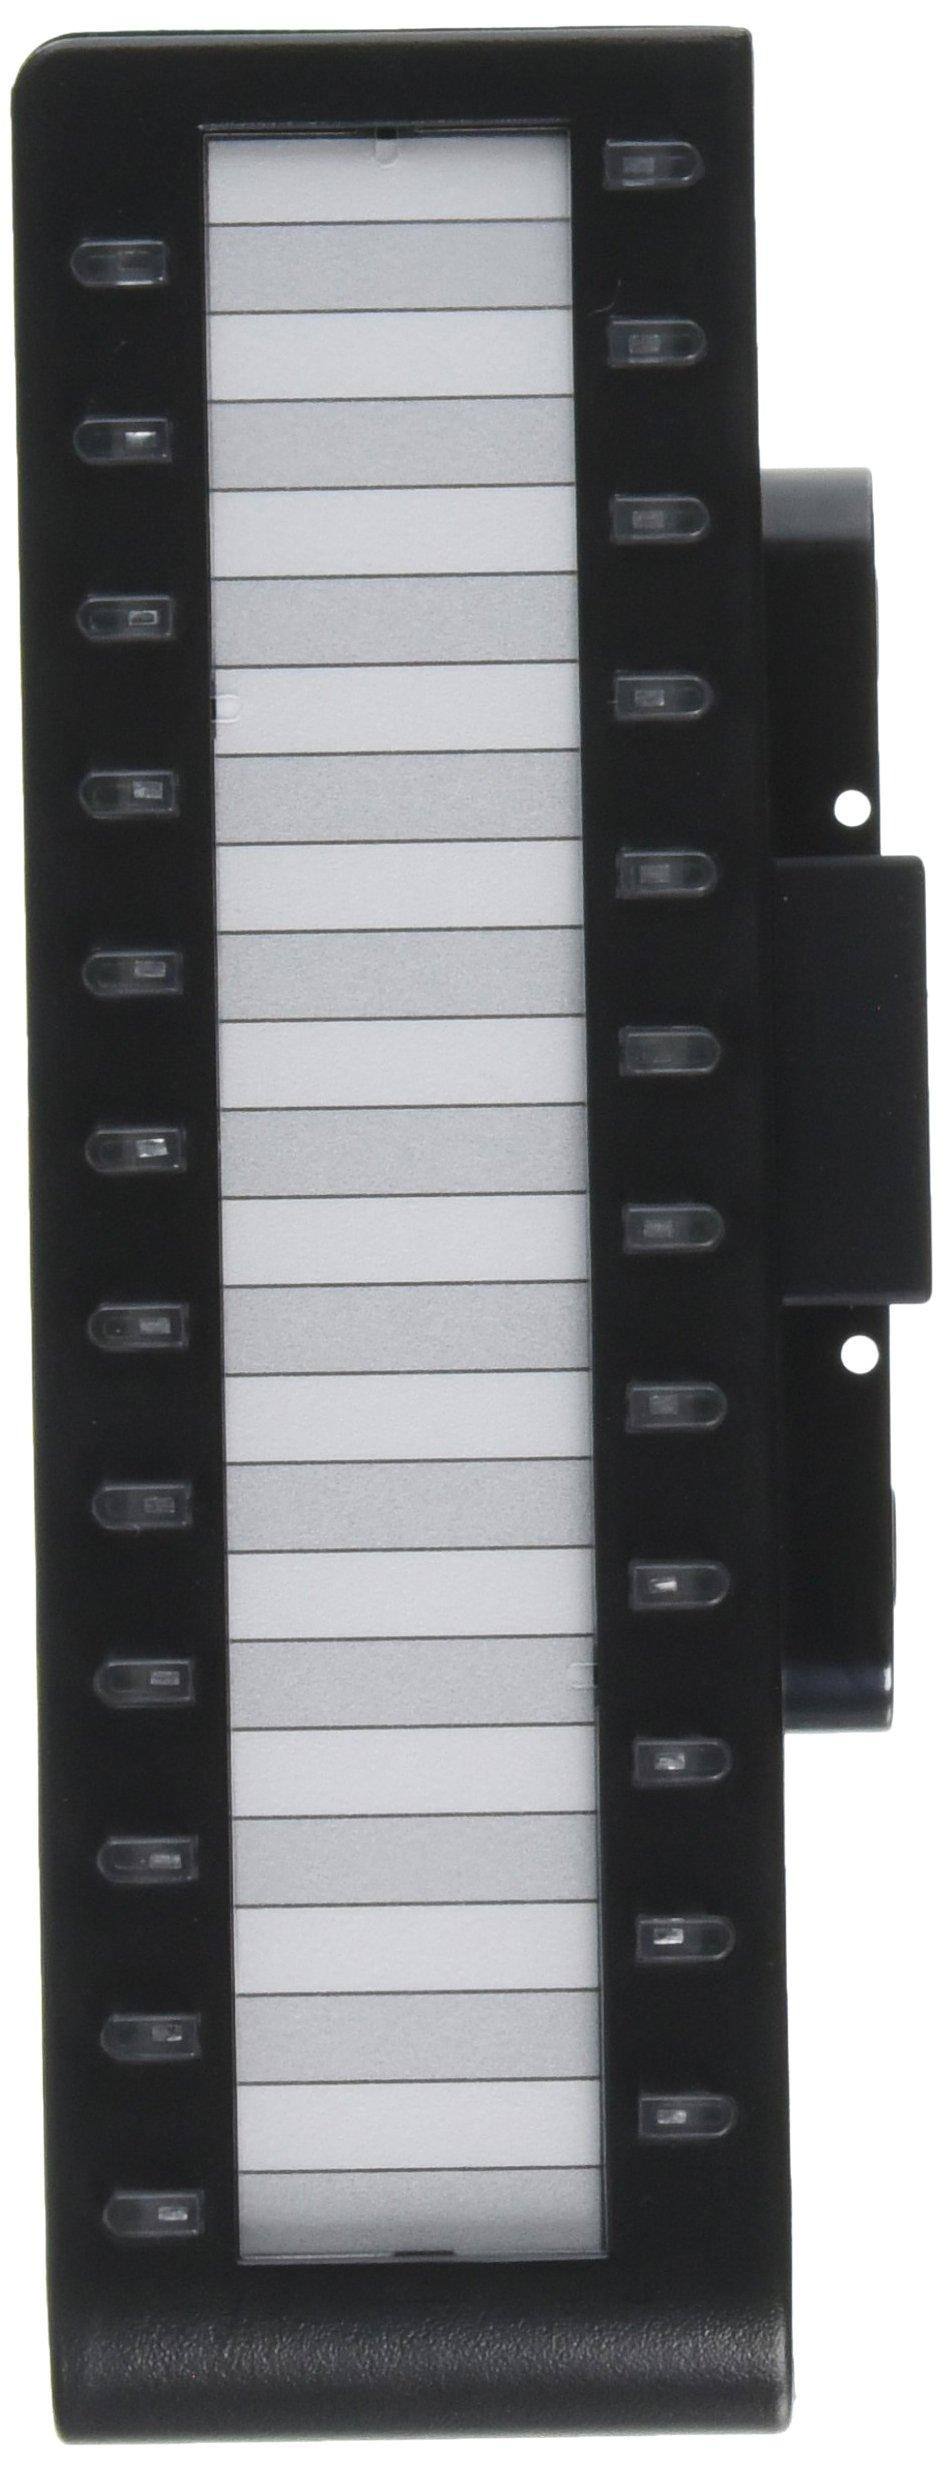 XBlue 47-9003 Modular Telephone Console for X-2020 IP Phone